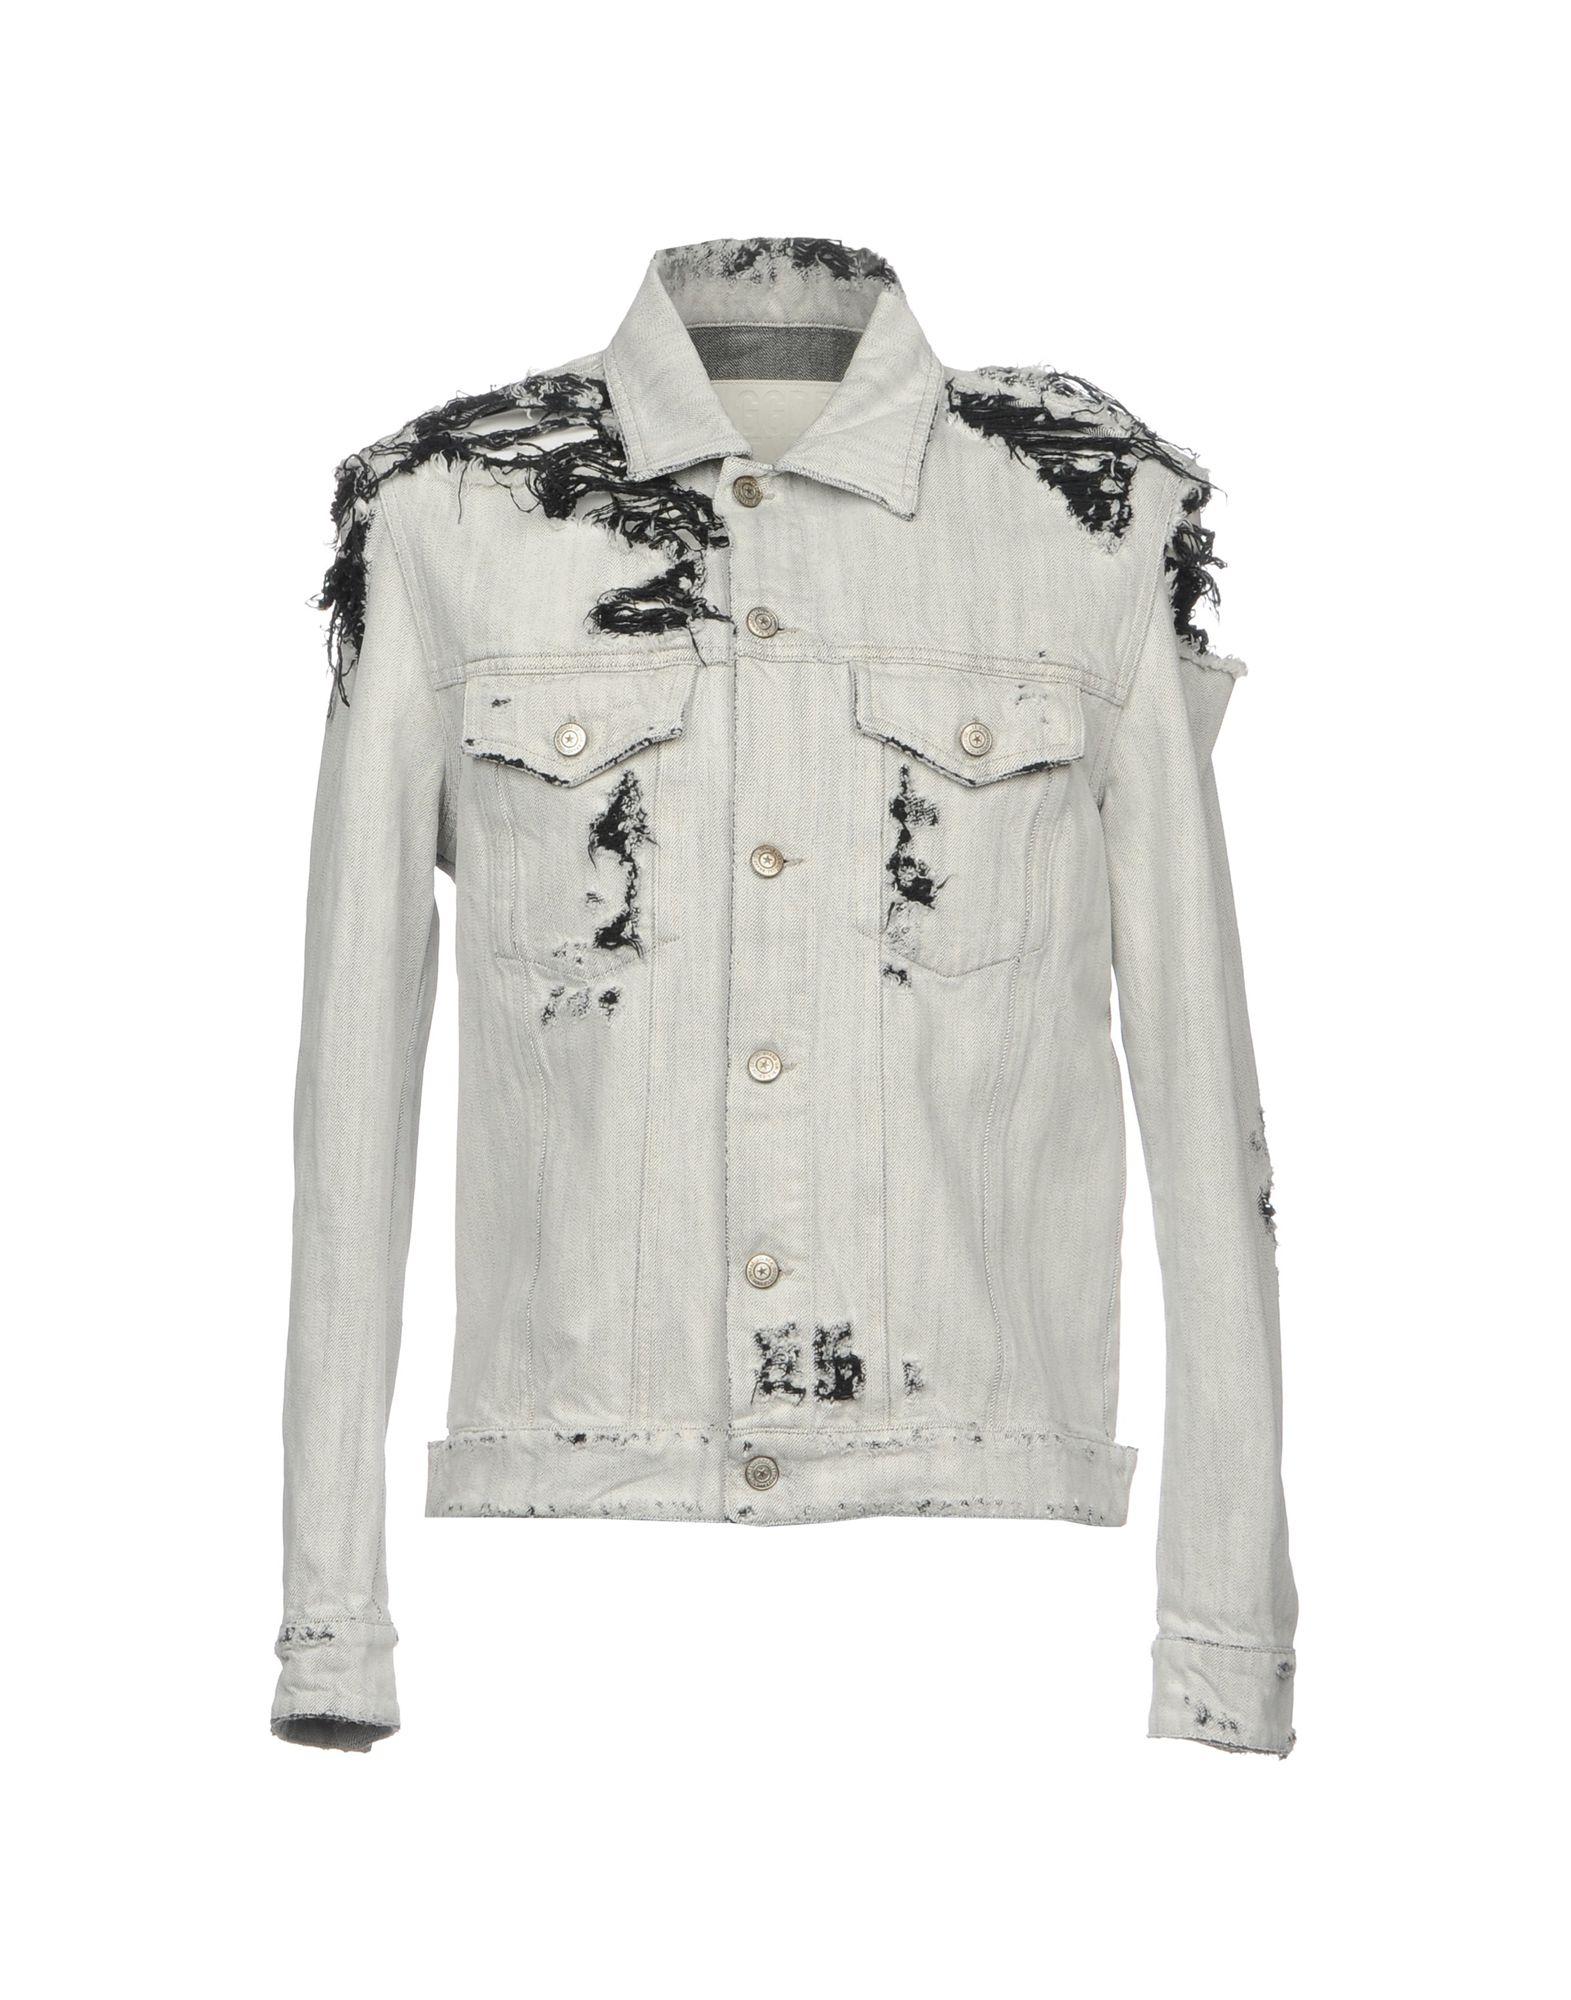 Giubbotto Jeans Golden Goose Deluxe Brand Uomo - Acquista online su